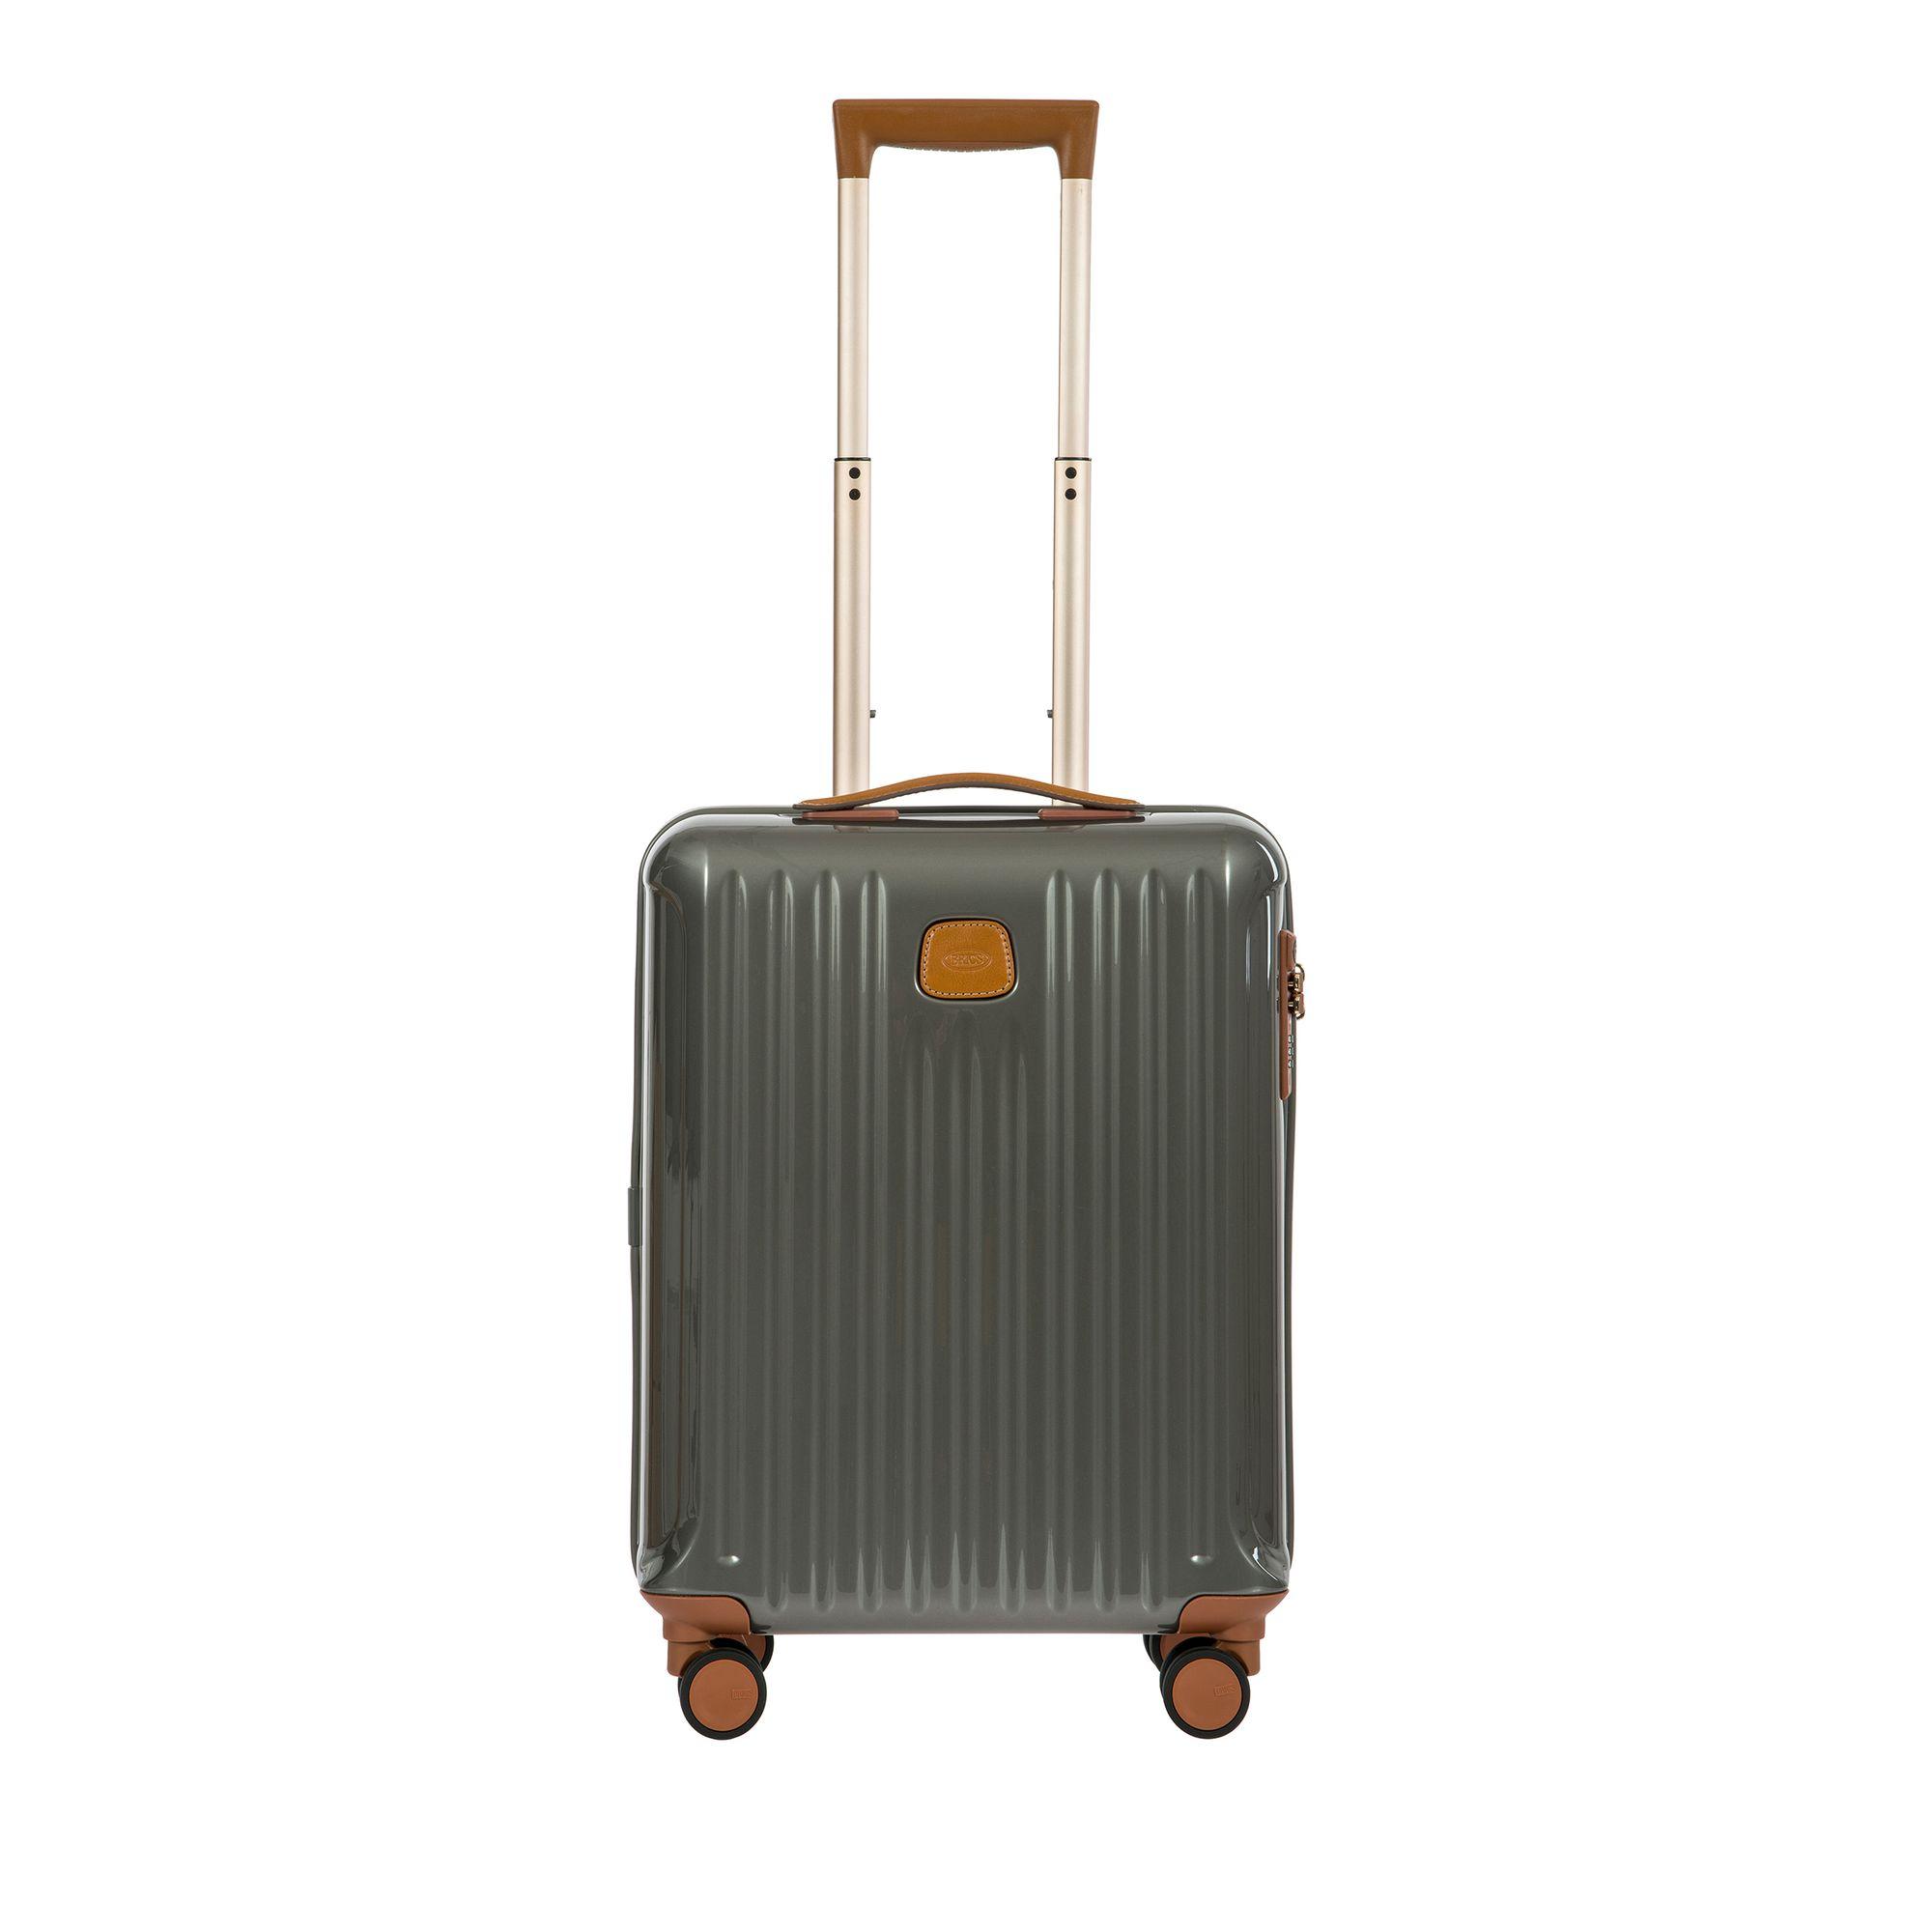 BRIC'S Capri hård kabinväska, 4 hjul, 55 cm, Grå